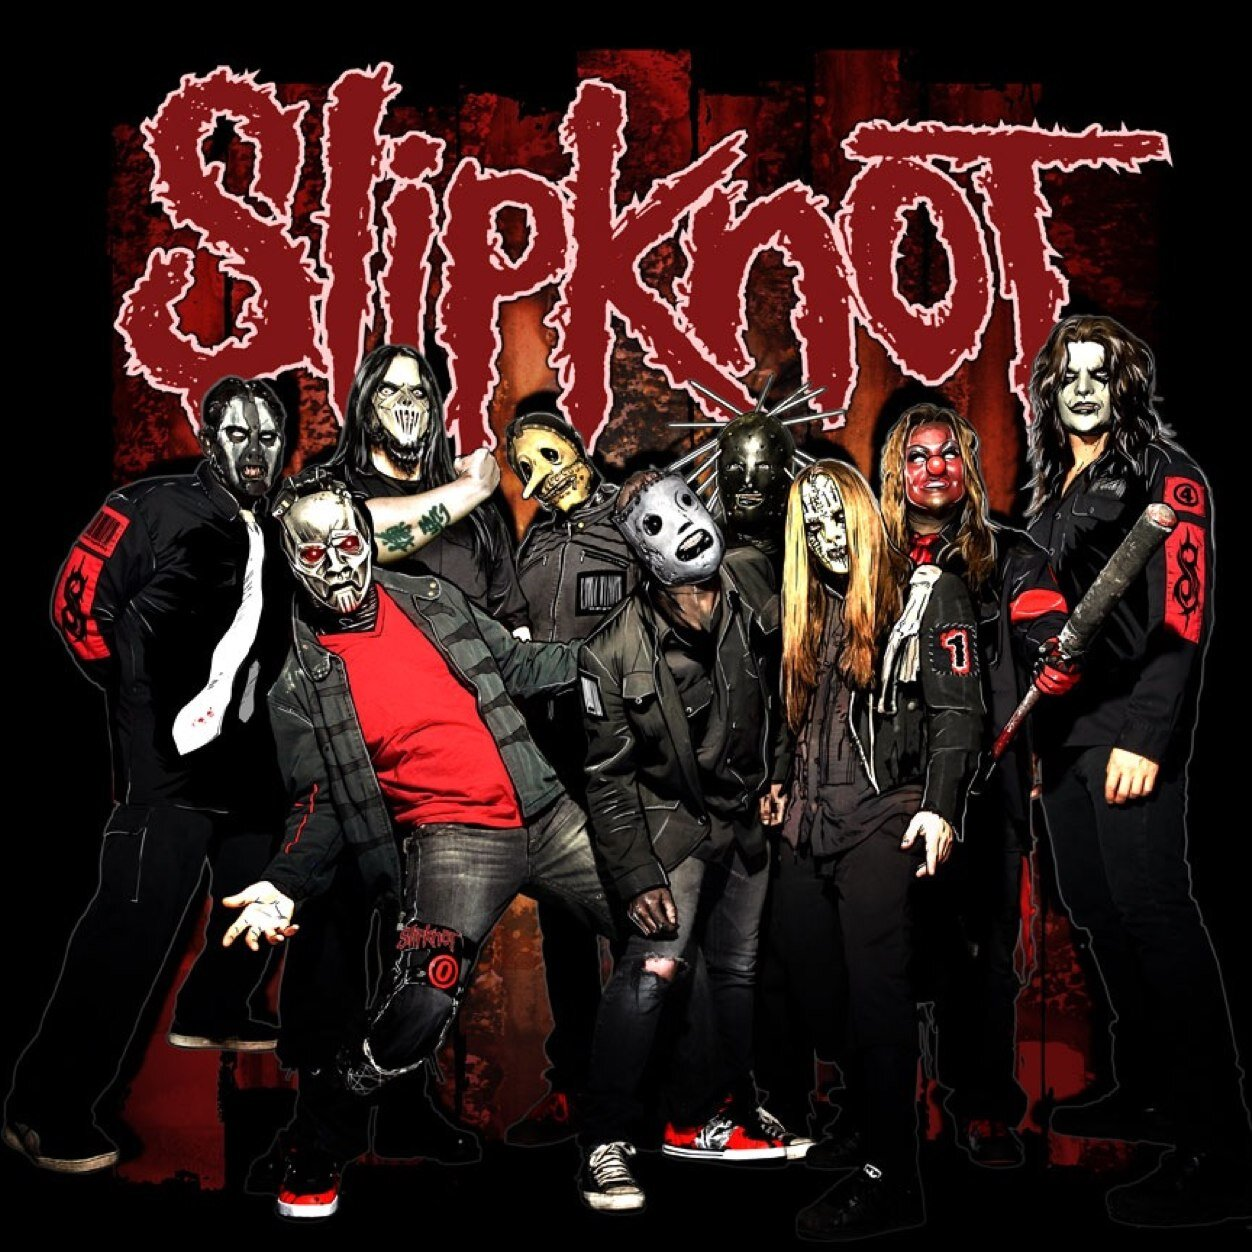 slipknot album free download